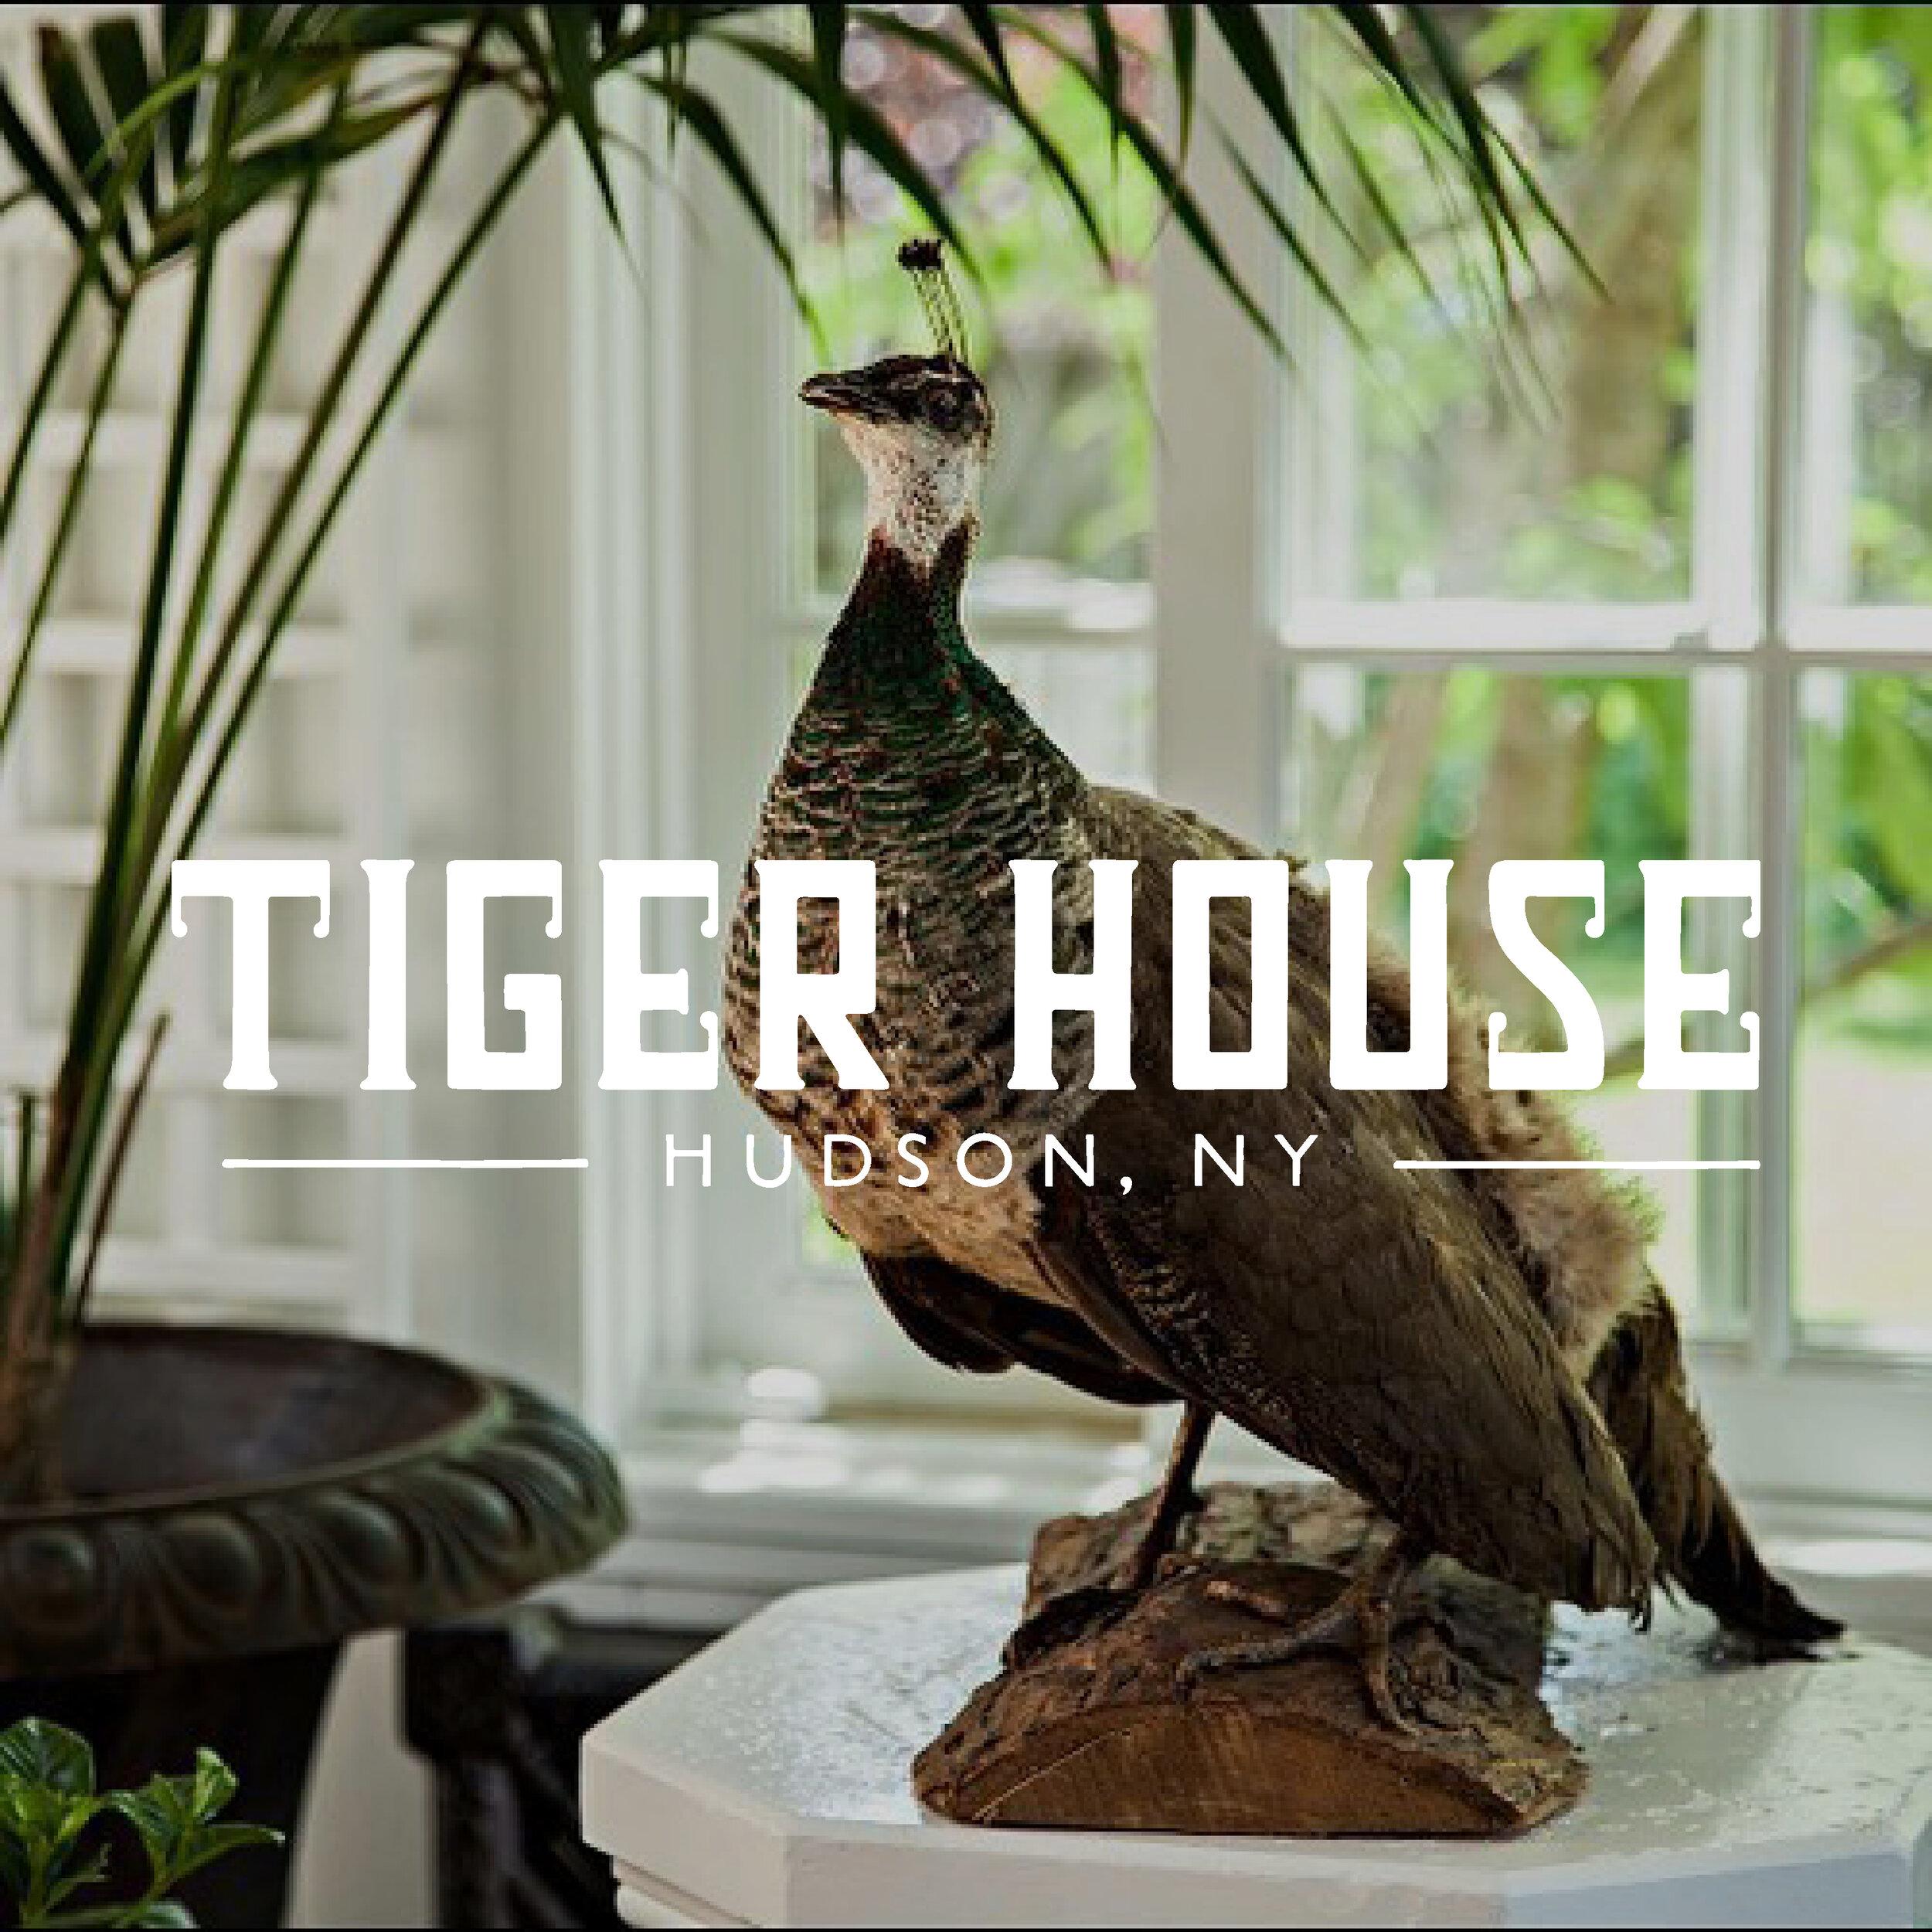 square graphics - 2019 Tiger house4.jpg